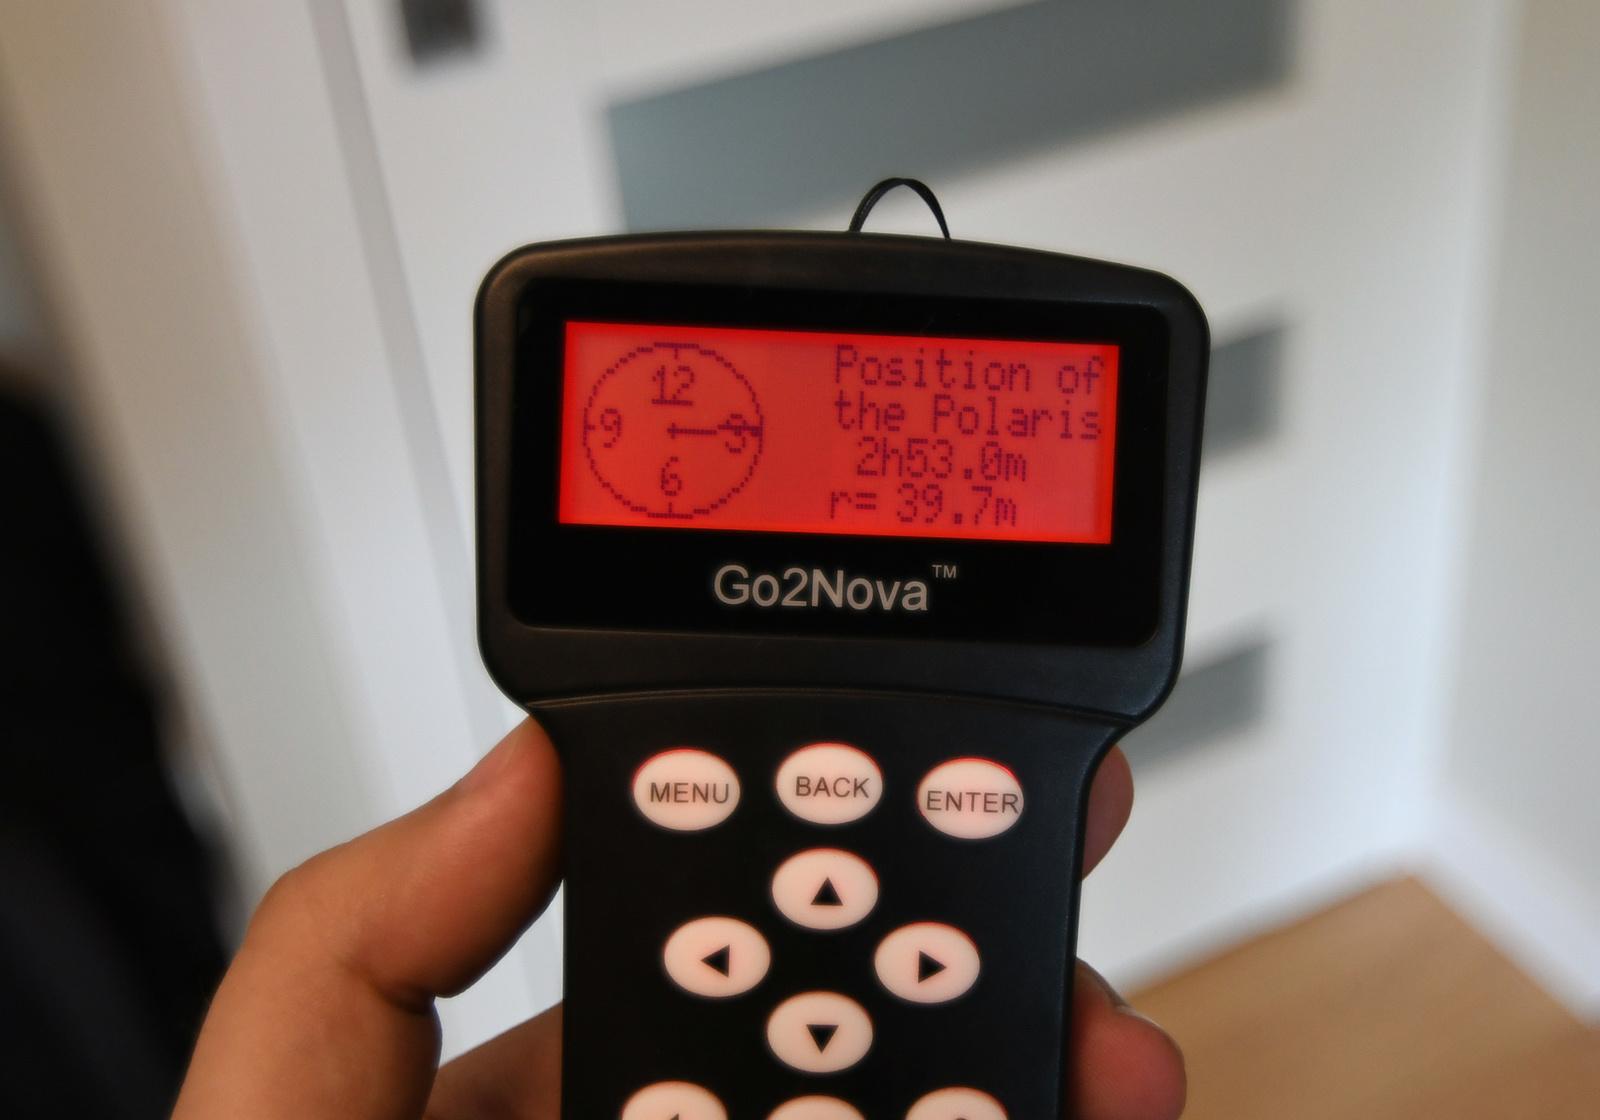 DSC_1254.thumb.jpg.d740fdce233ce2244cb8dd69a340c2ad.jpg